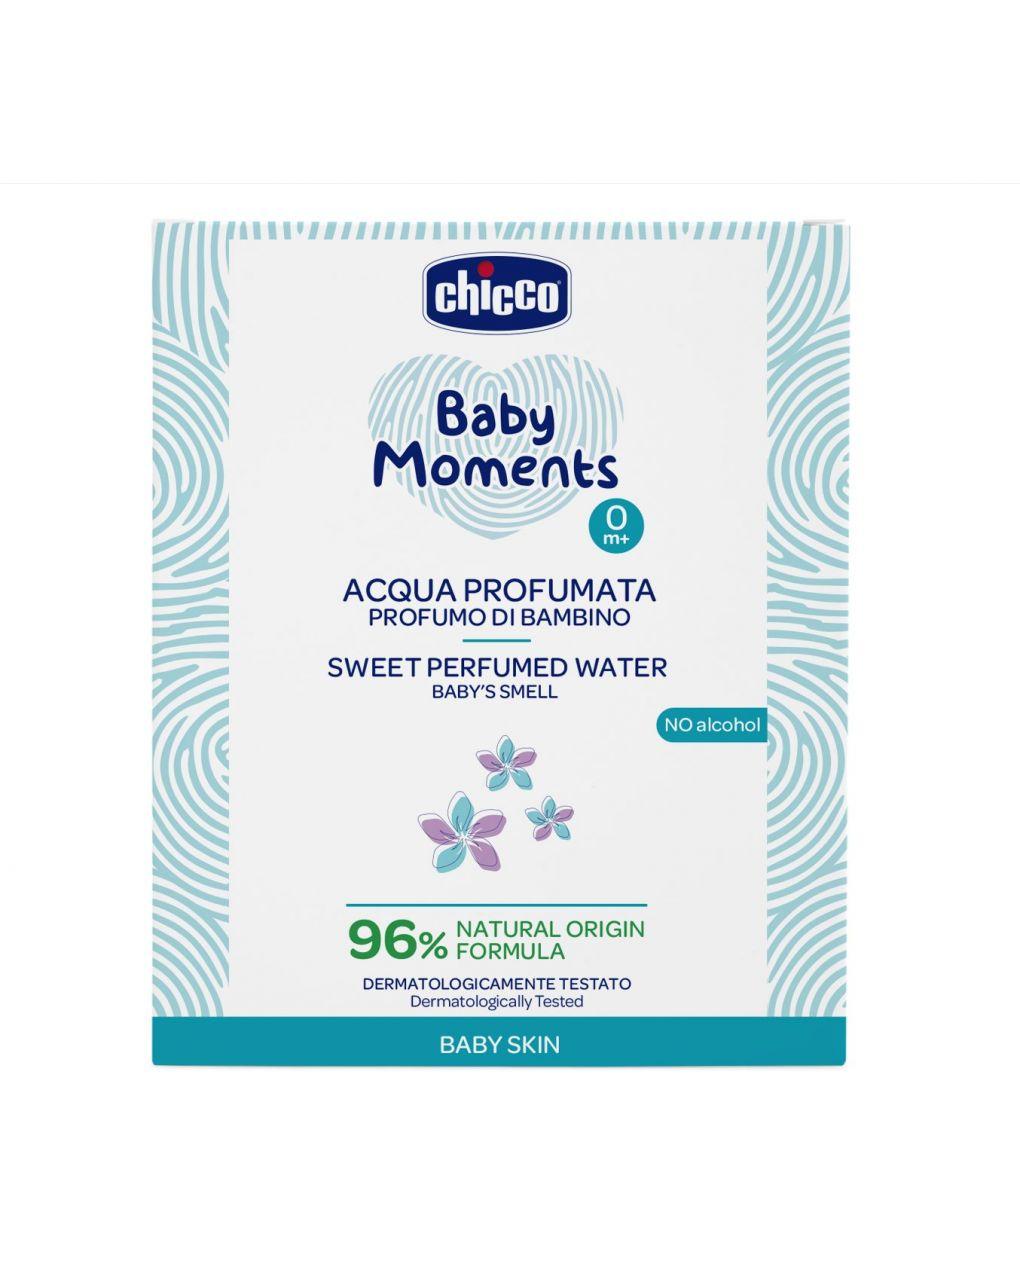 Acqua profumata baby moments chicco baby skin - Chicco